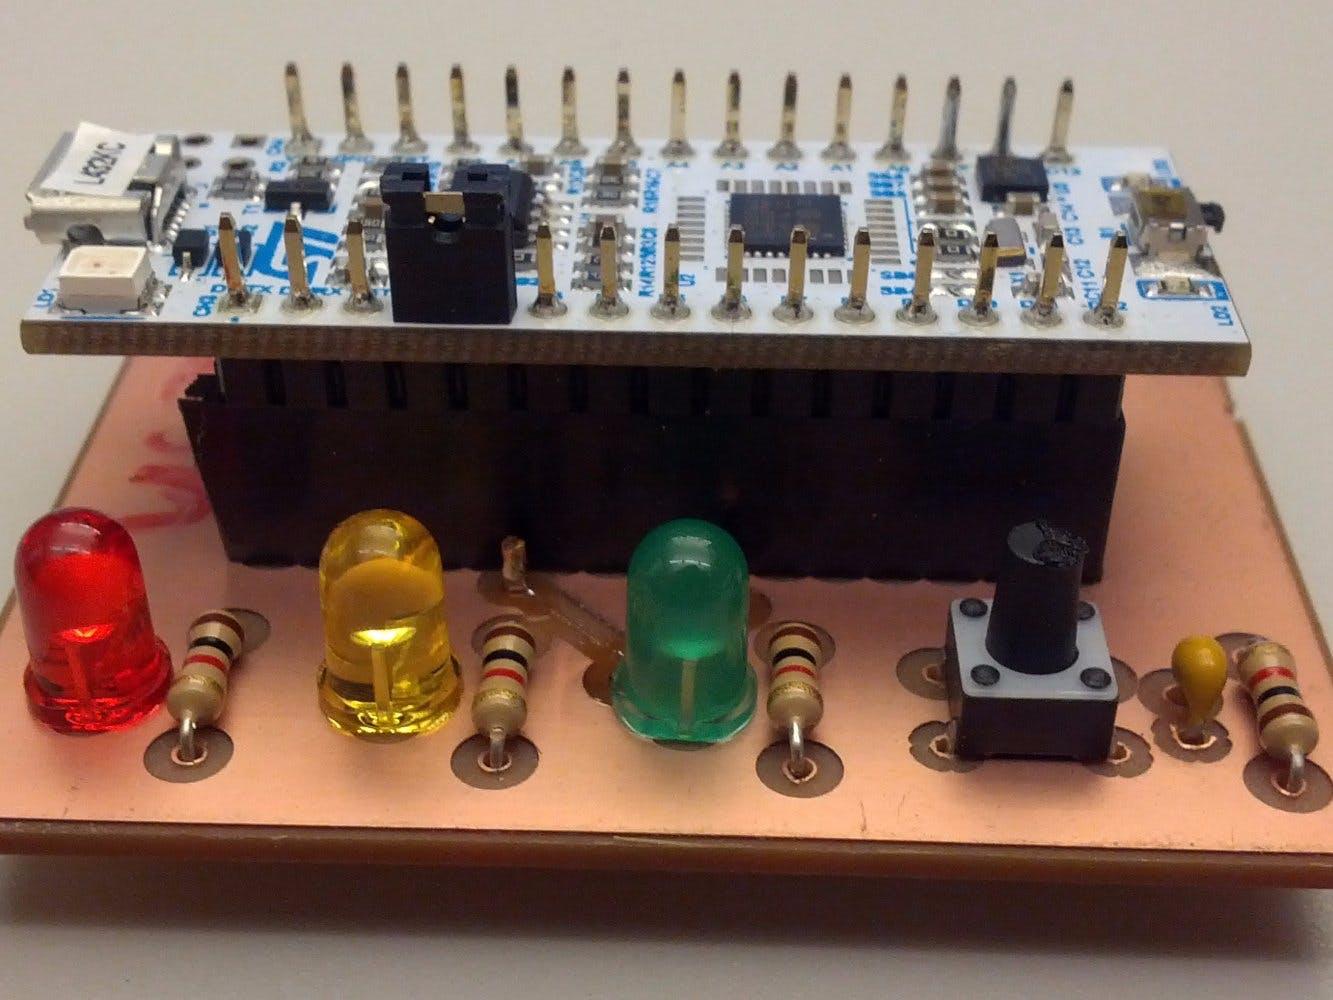 Custom PCB Board Fabrication